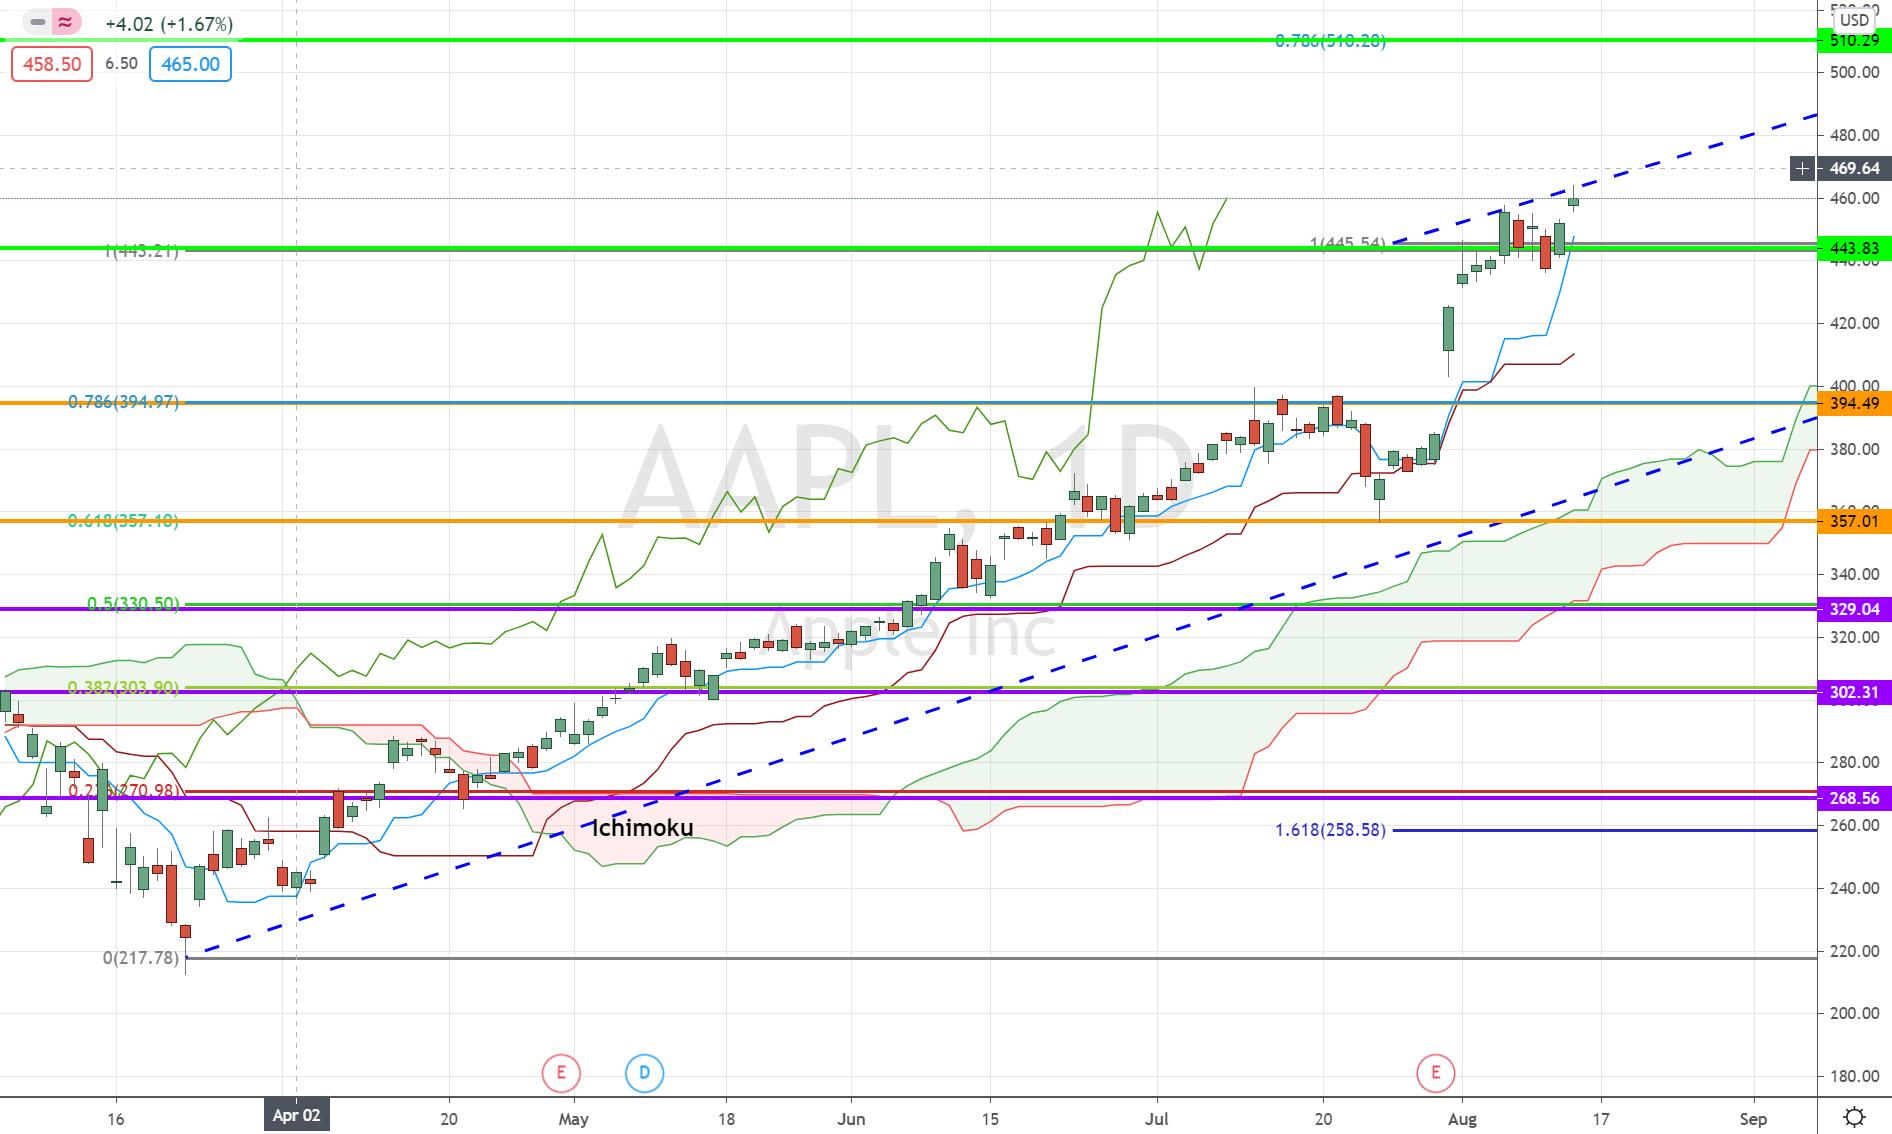 Apple stock (AAPL) price analysis 2020 before stock split